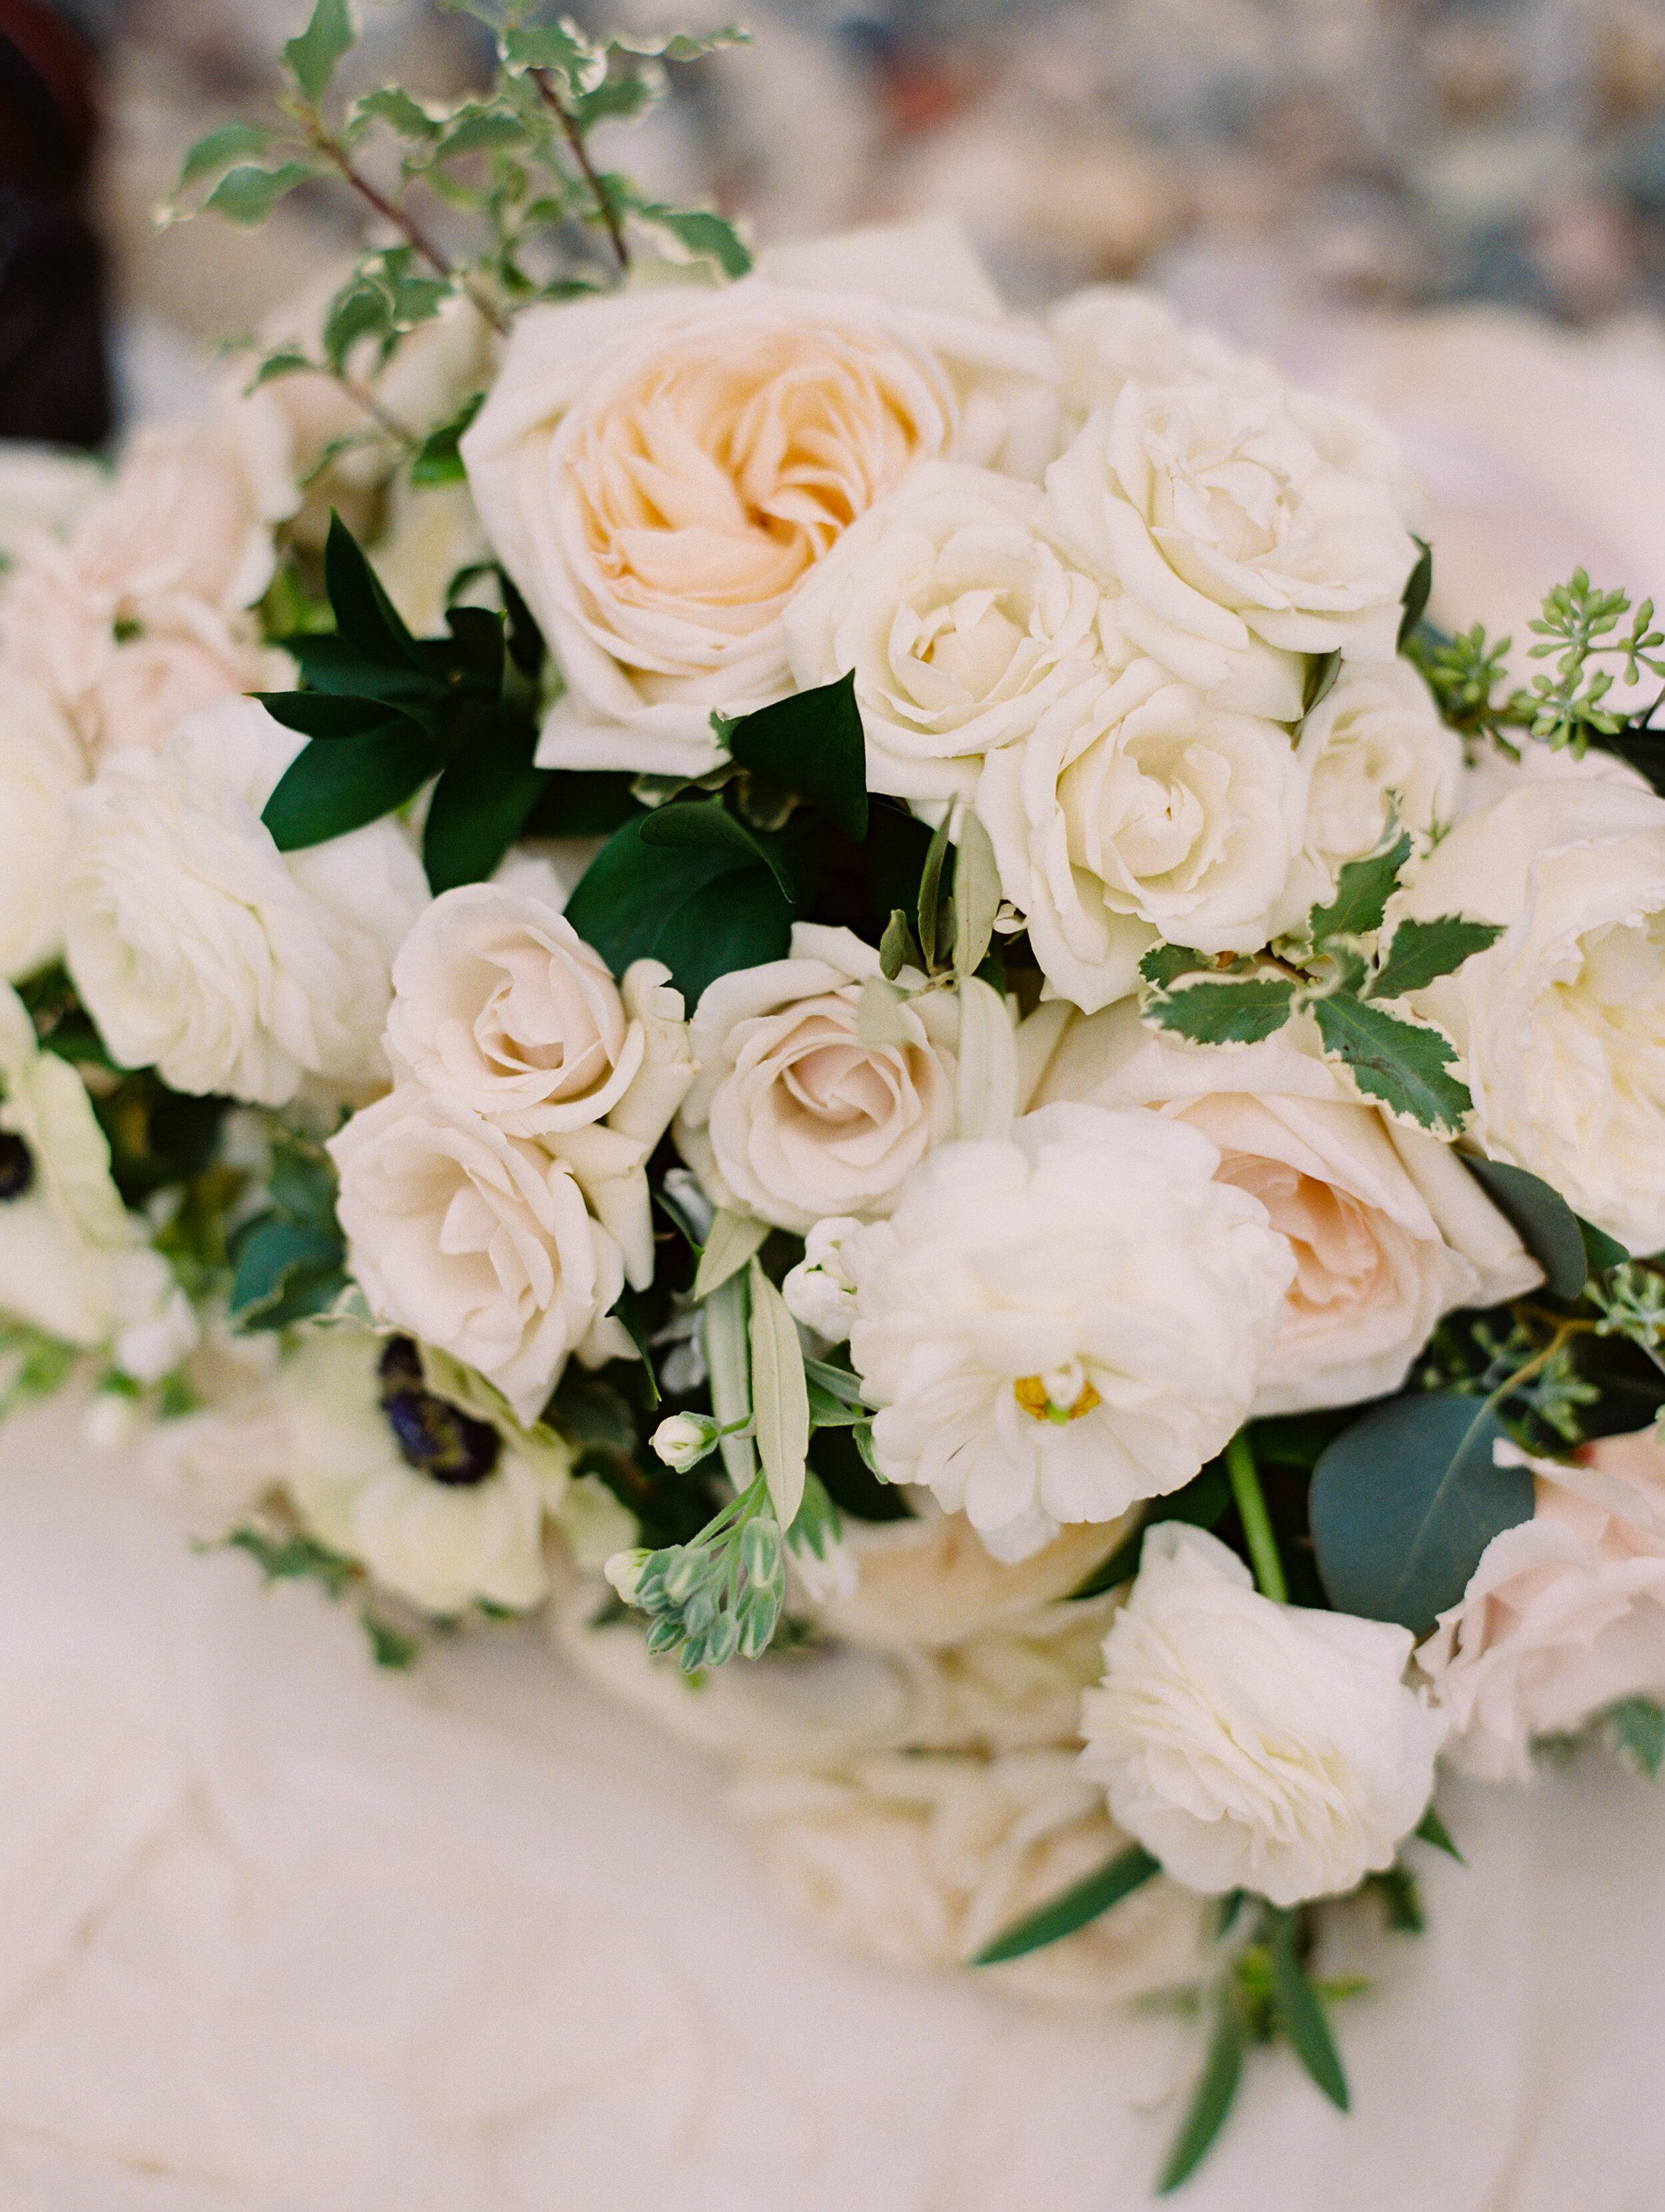 Kuiper+Wedding+Details-61.jpg